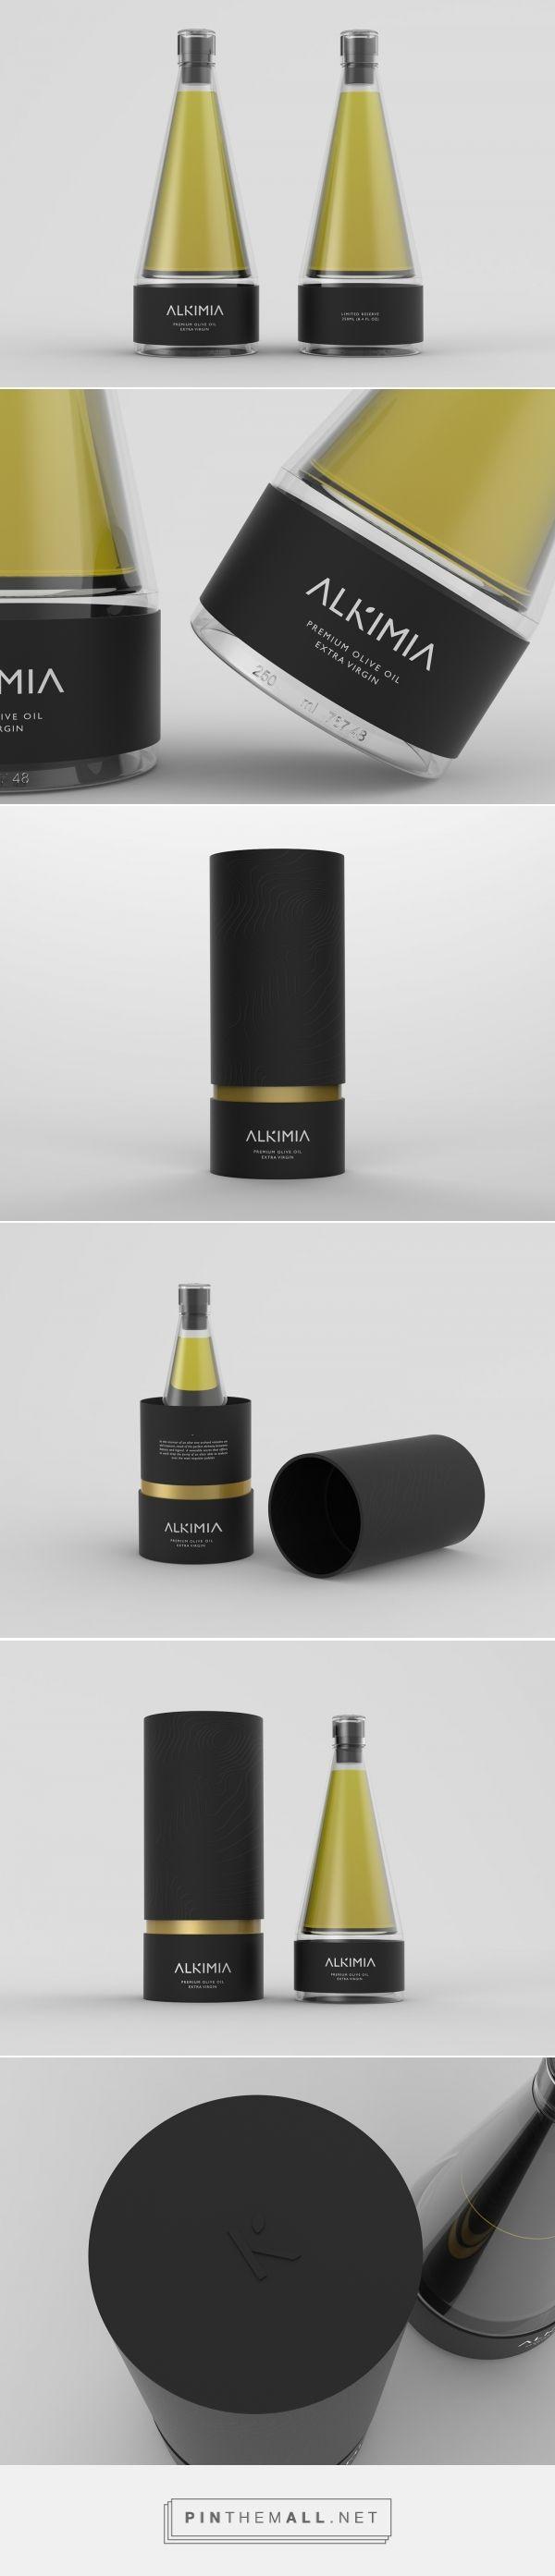 Alkimia Olive Oil Packaging on Behance   Fivestar Branding – Design and Branding Agency & Inspiration Gallery